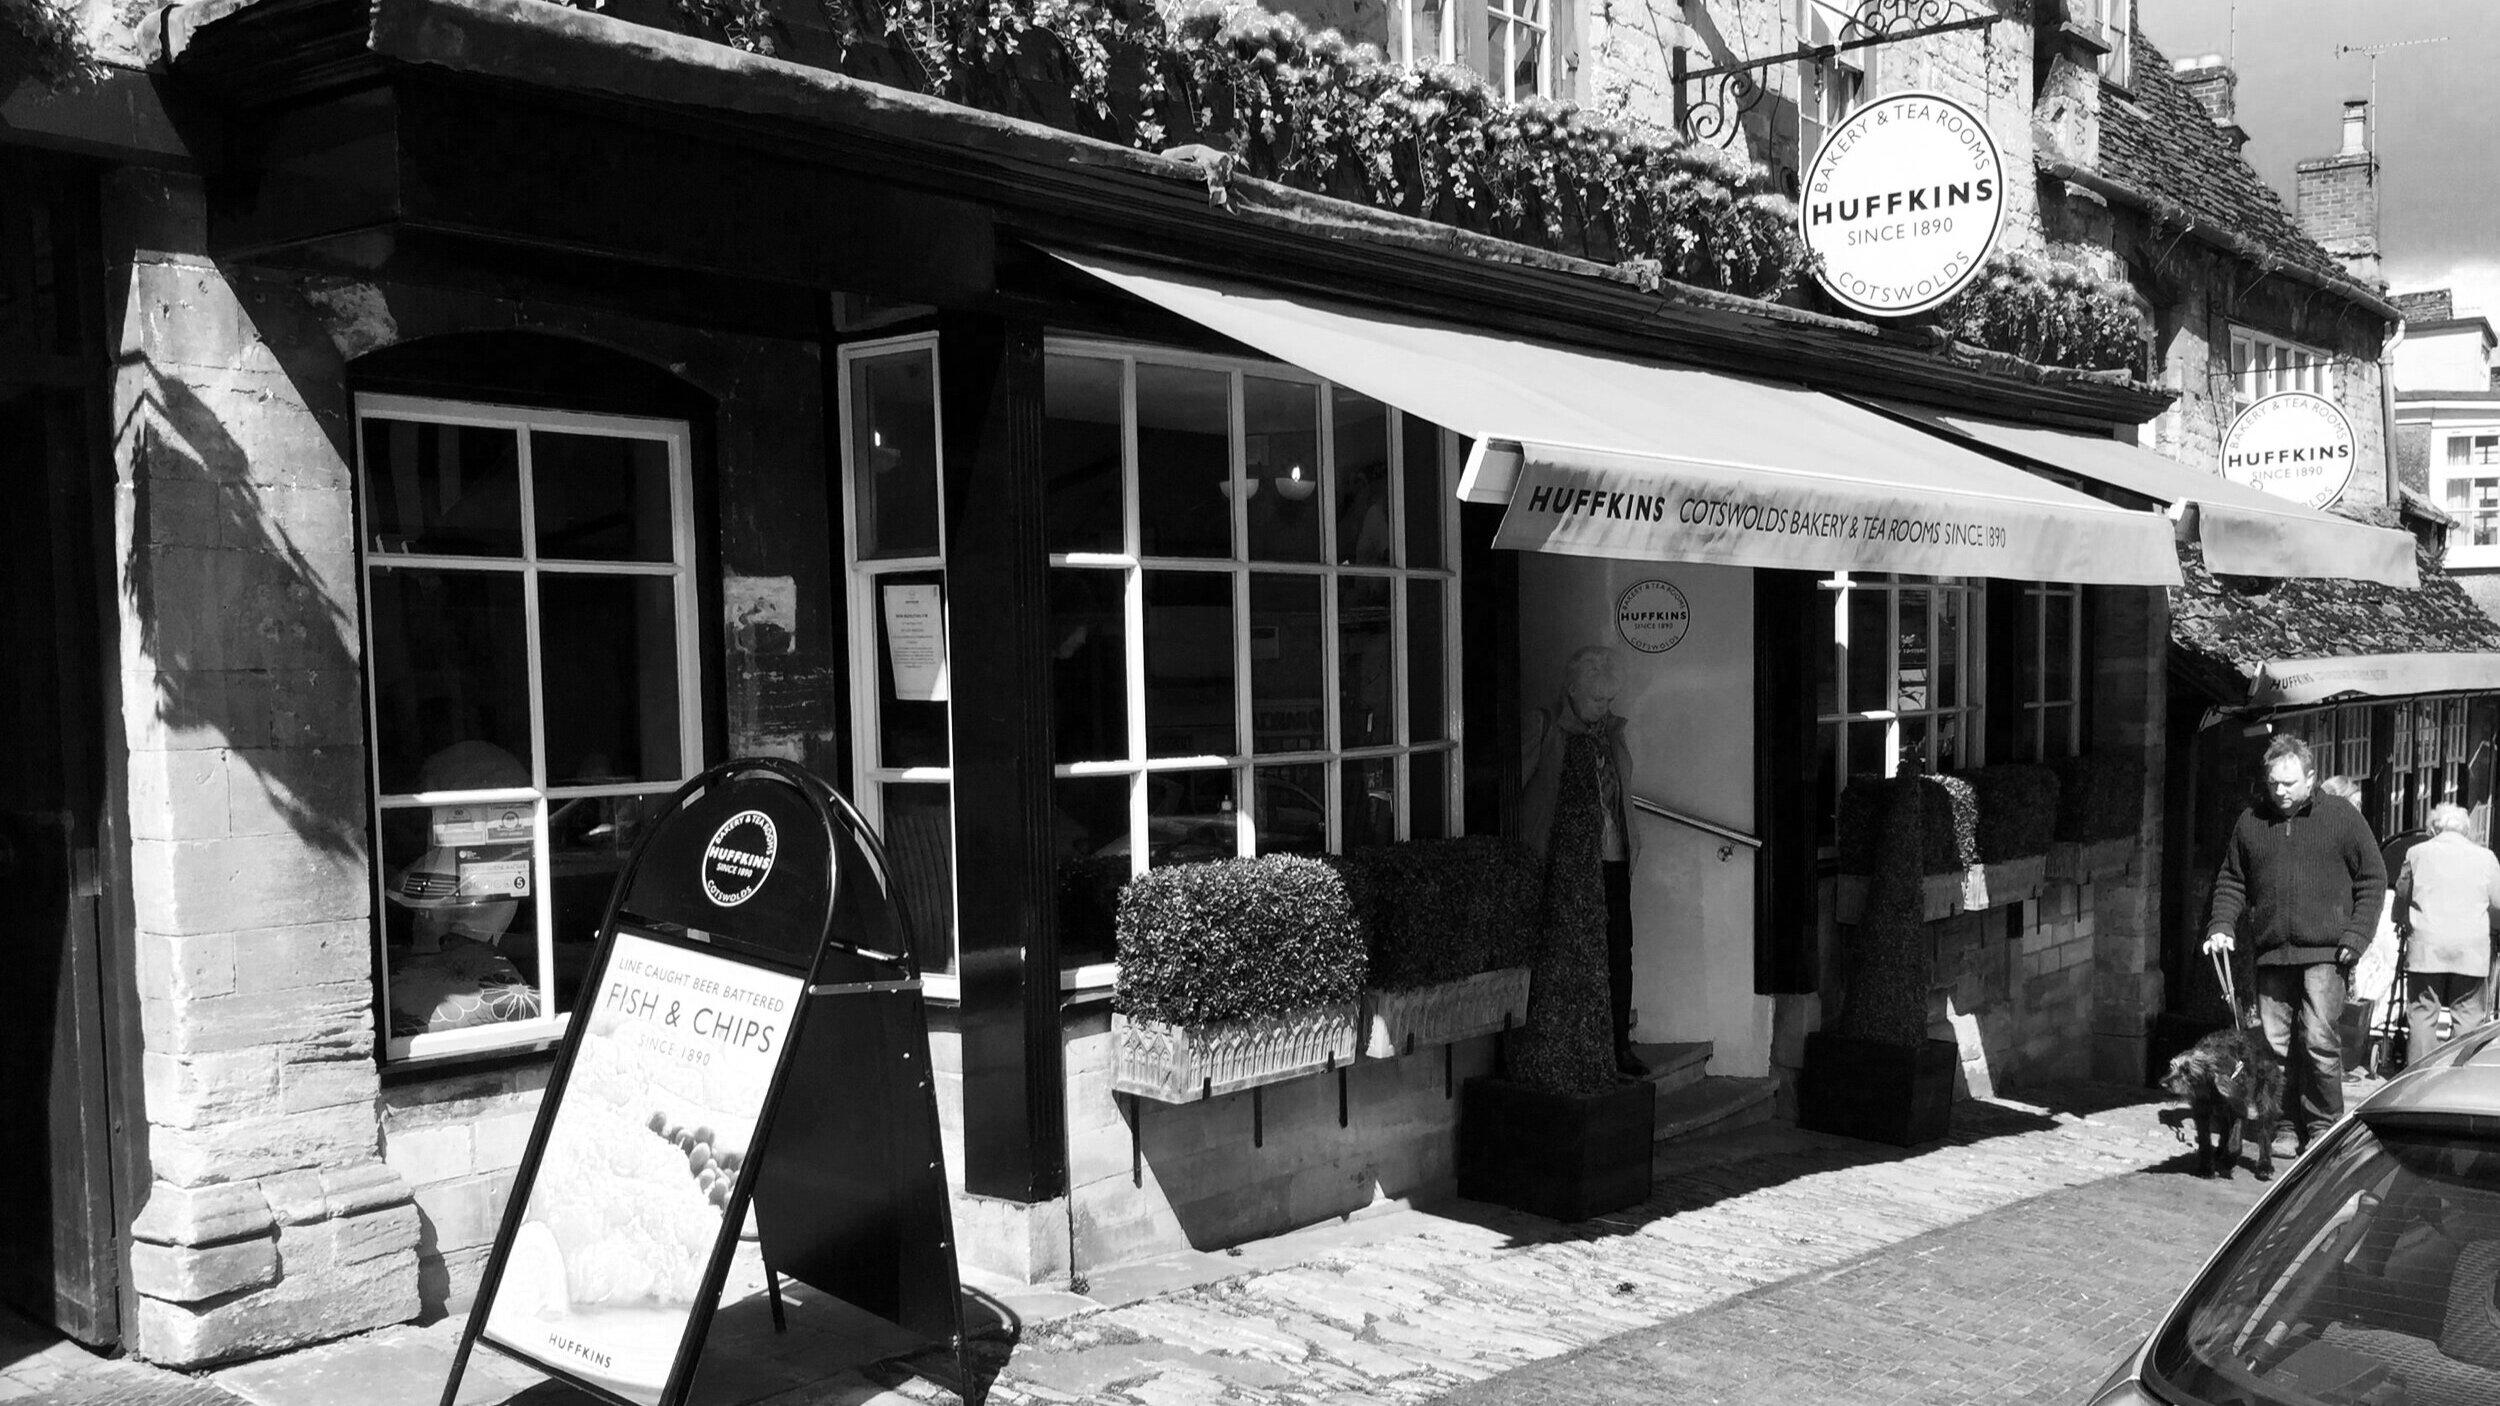 Huffkins+Tearoom+%26+Bakery+Burford.jpg